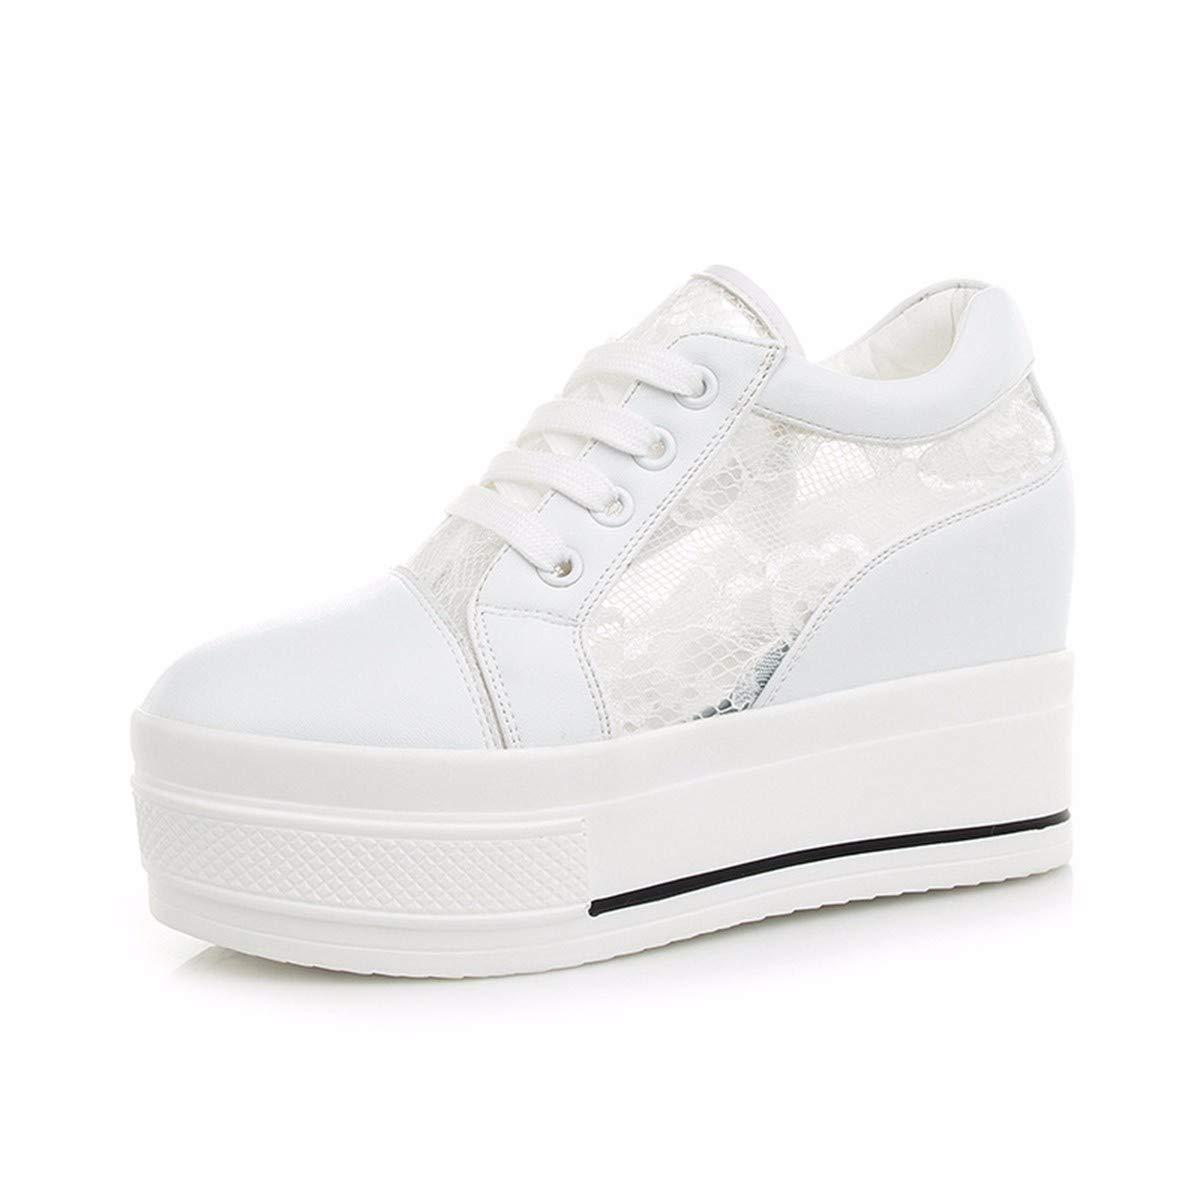 KPHY Damenschuhe Sommer Mesh Atmungsaktiv Dicke Zusammenbrach Casual Casual Casual Schuhen Ladies'schuhe Weiße 36 a1099e